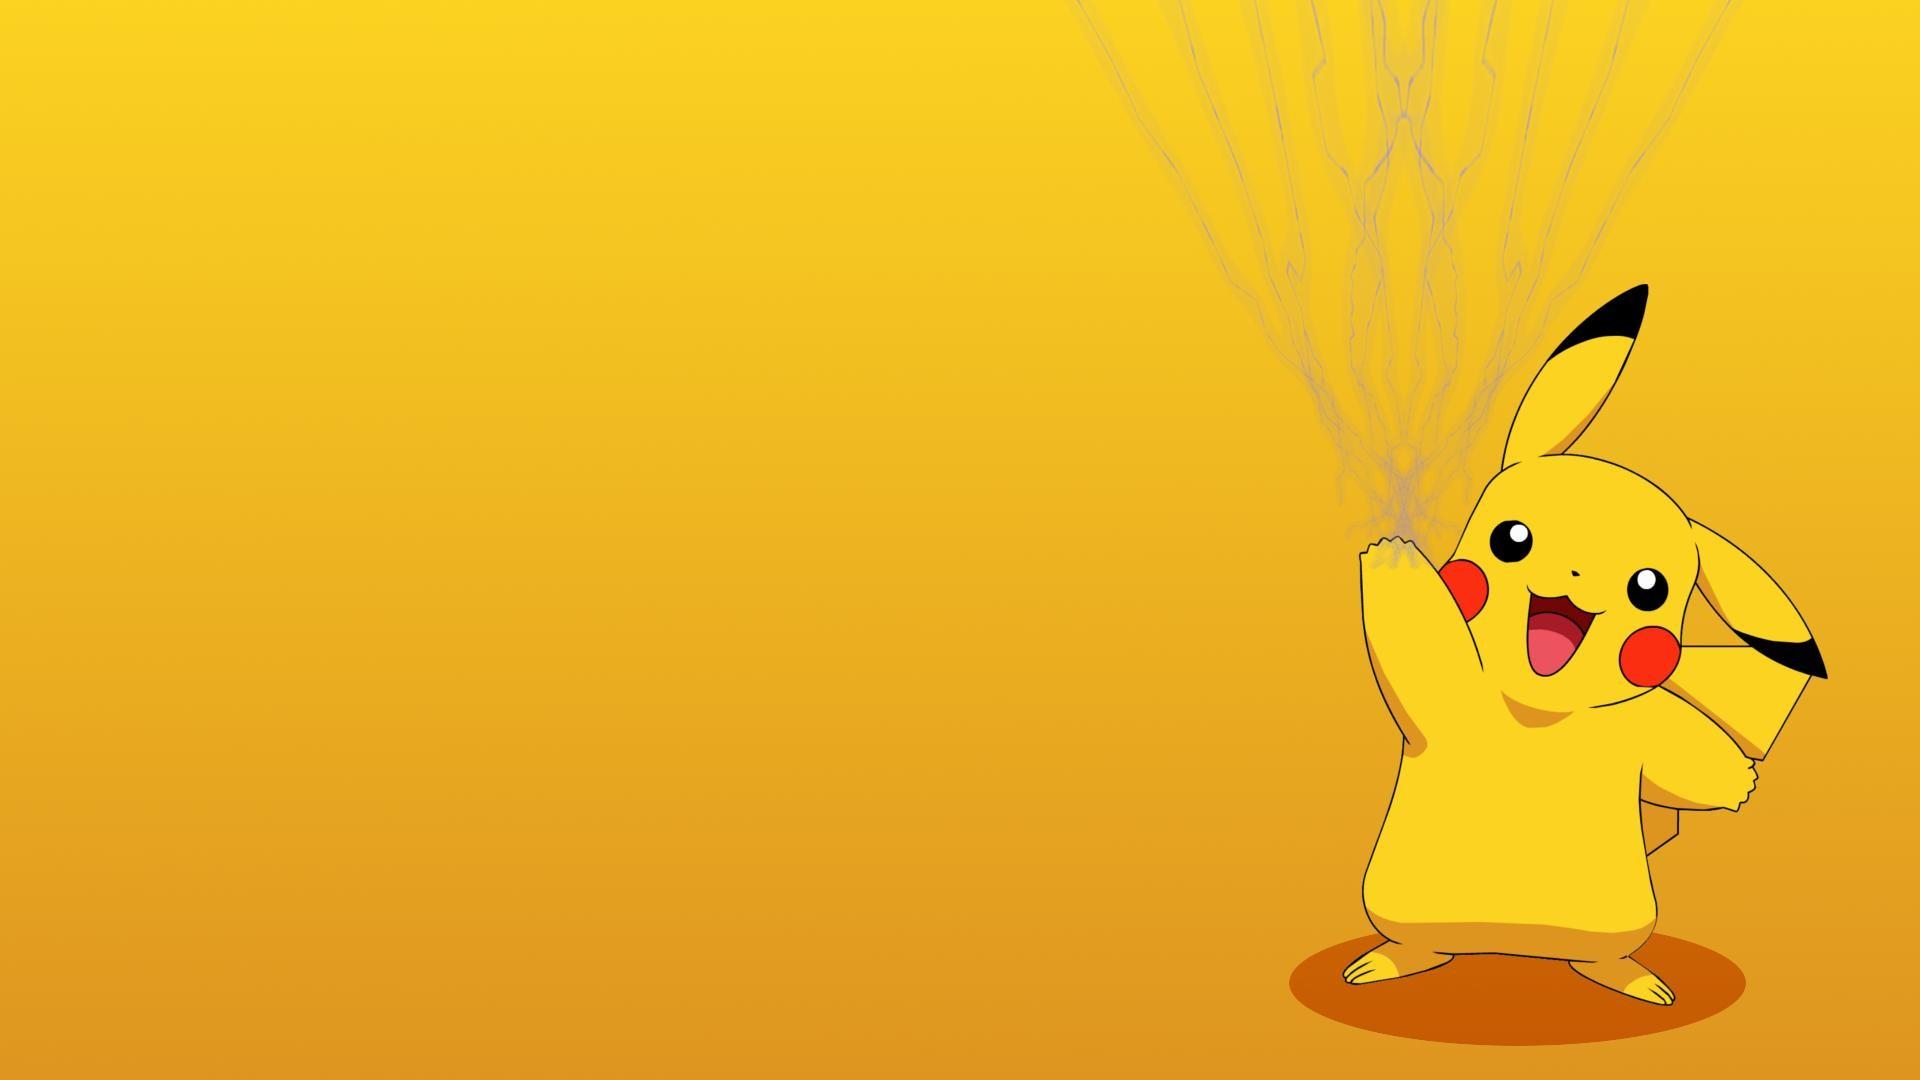 Eideard-Blare-widescreen-hd-winter-pikachu-1920-x-